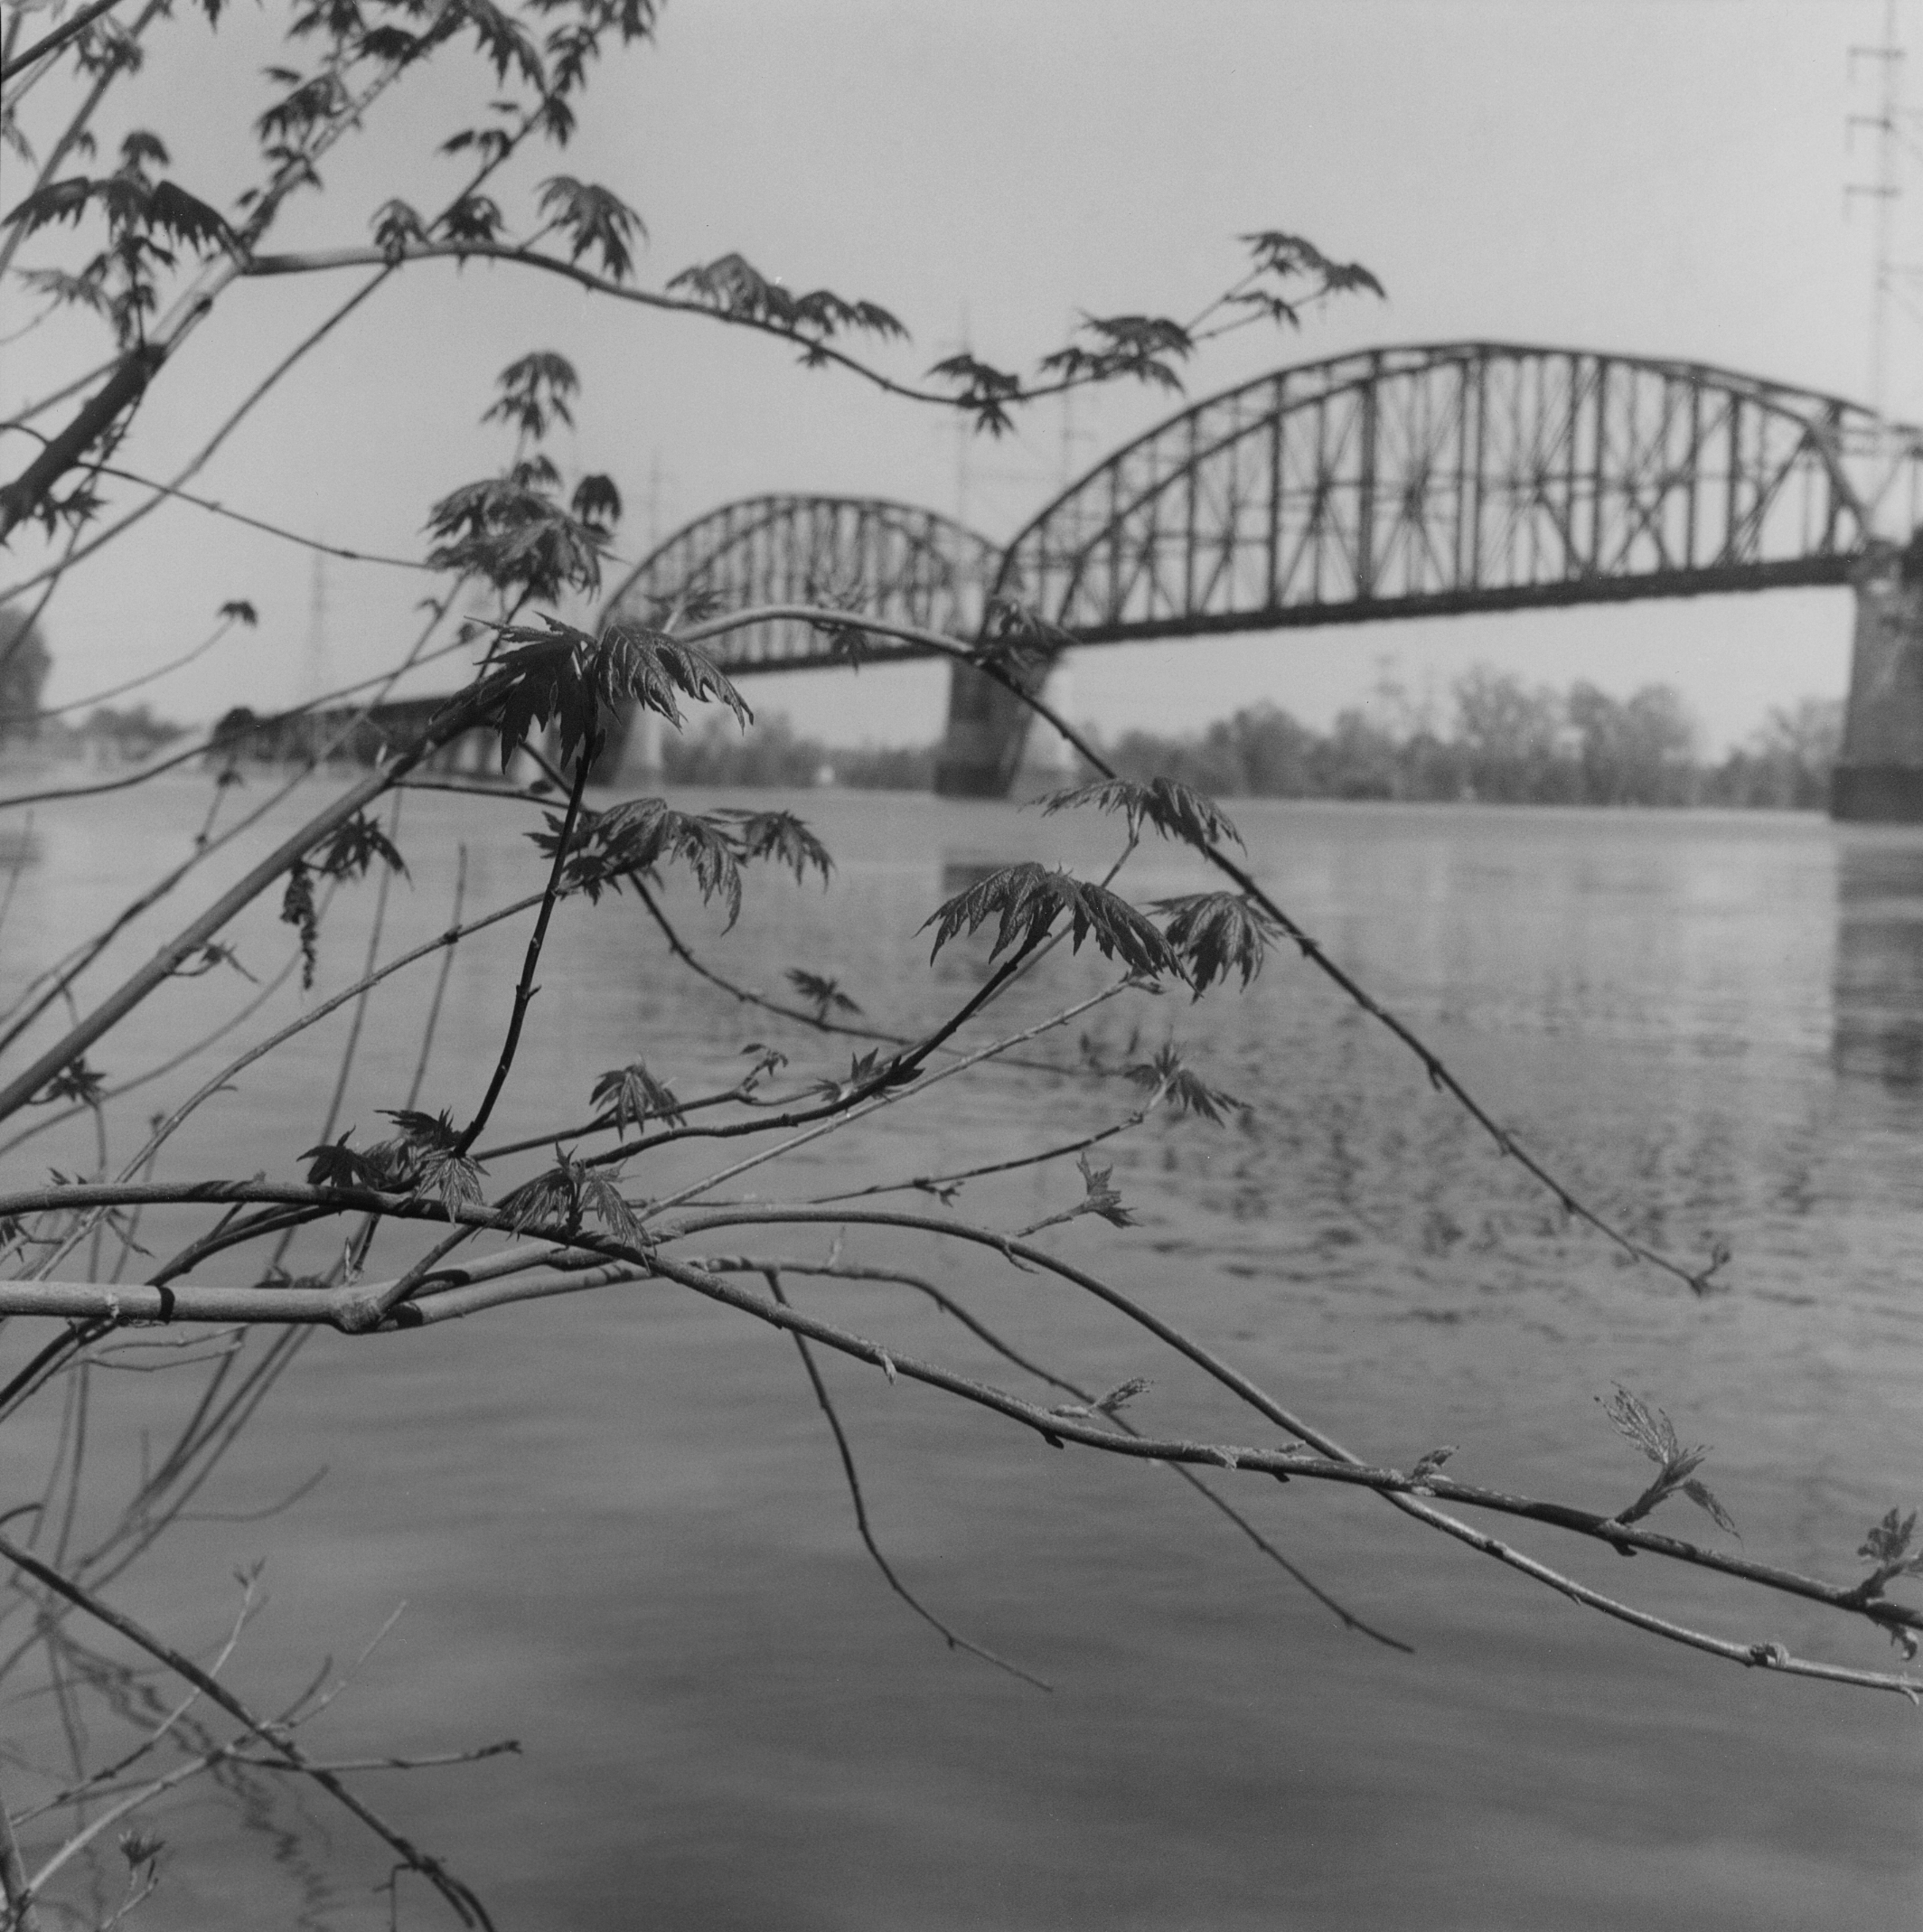 Mary Meachum Freedom Crossing with Bridge, St. Louis, Missouri, 2010